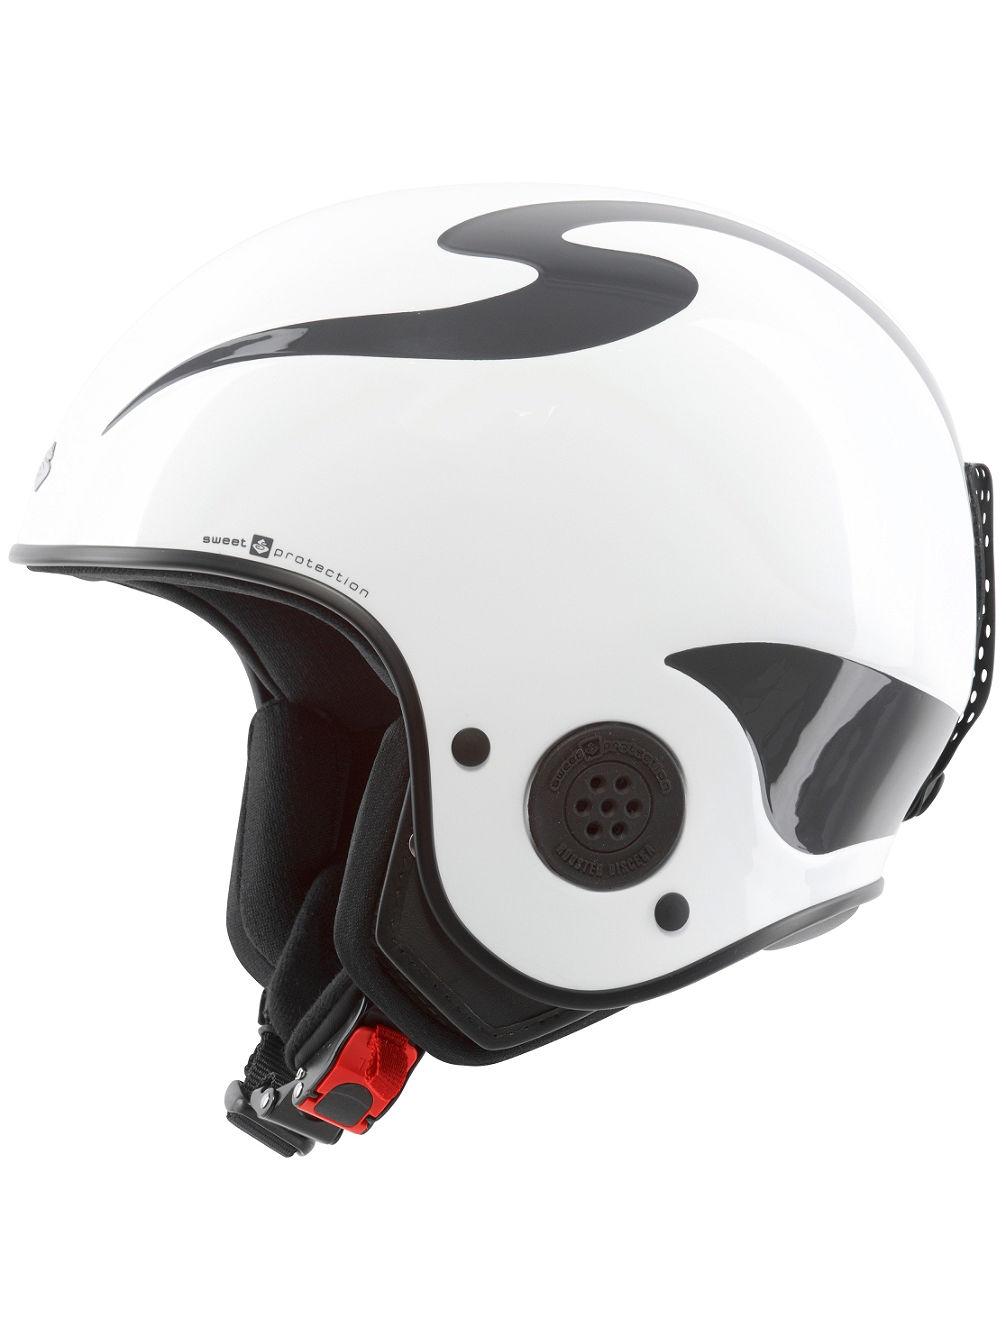 sweet-protection-rooster-discesa-s-helmet